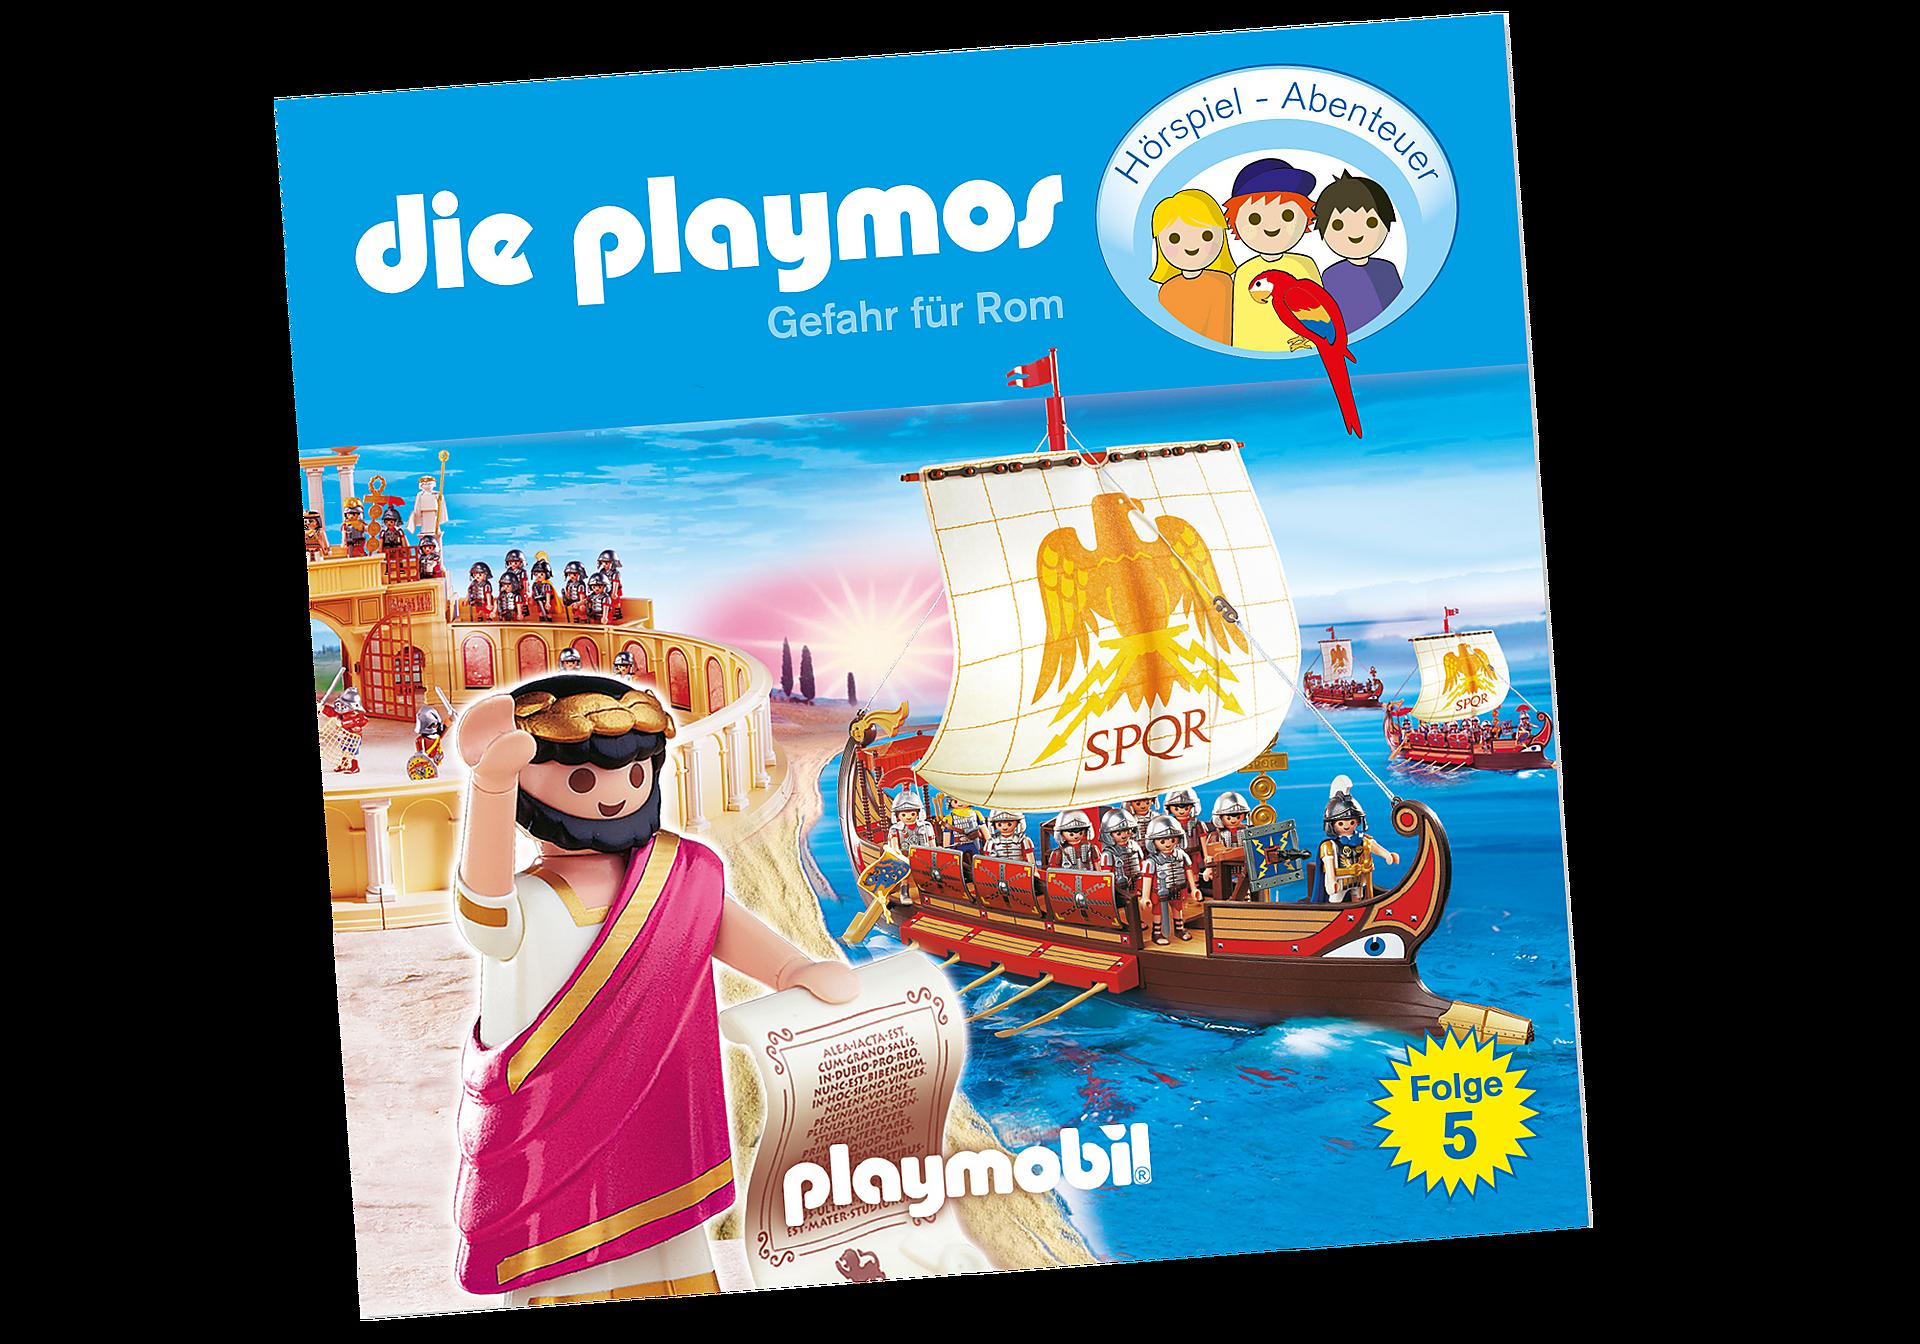 http://media.playmobil.com/i/playmobil/80157_product_detail/Gefahr für Rom (5) - CD